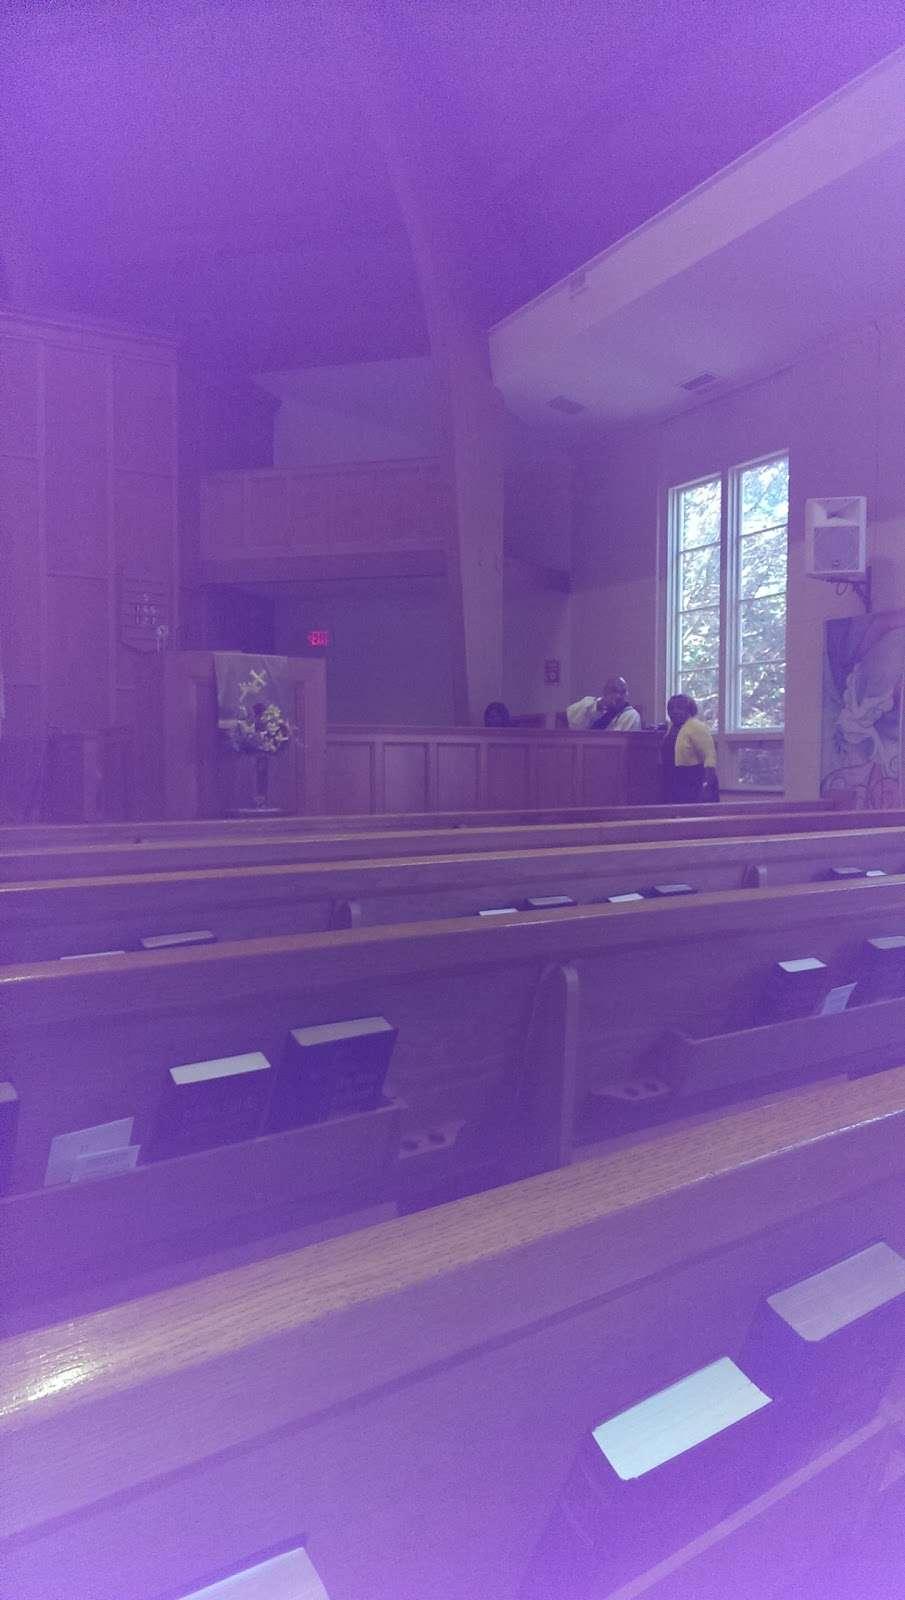 First Baptist Church - church  | Photo 3 of 3 | Address: 407 New Rochelle Rd, Bronxville, NY 10708, USA | Phone: (914) 793-2560